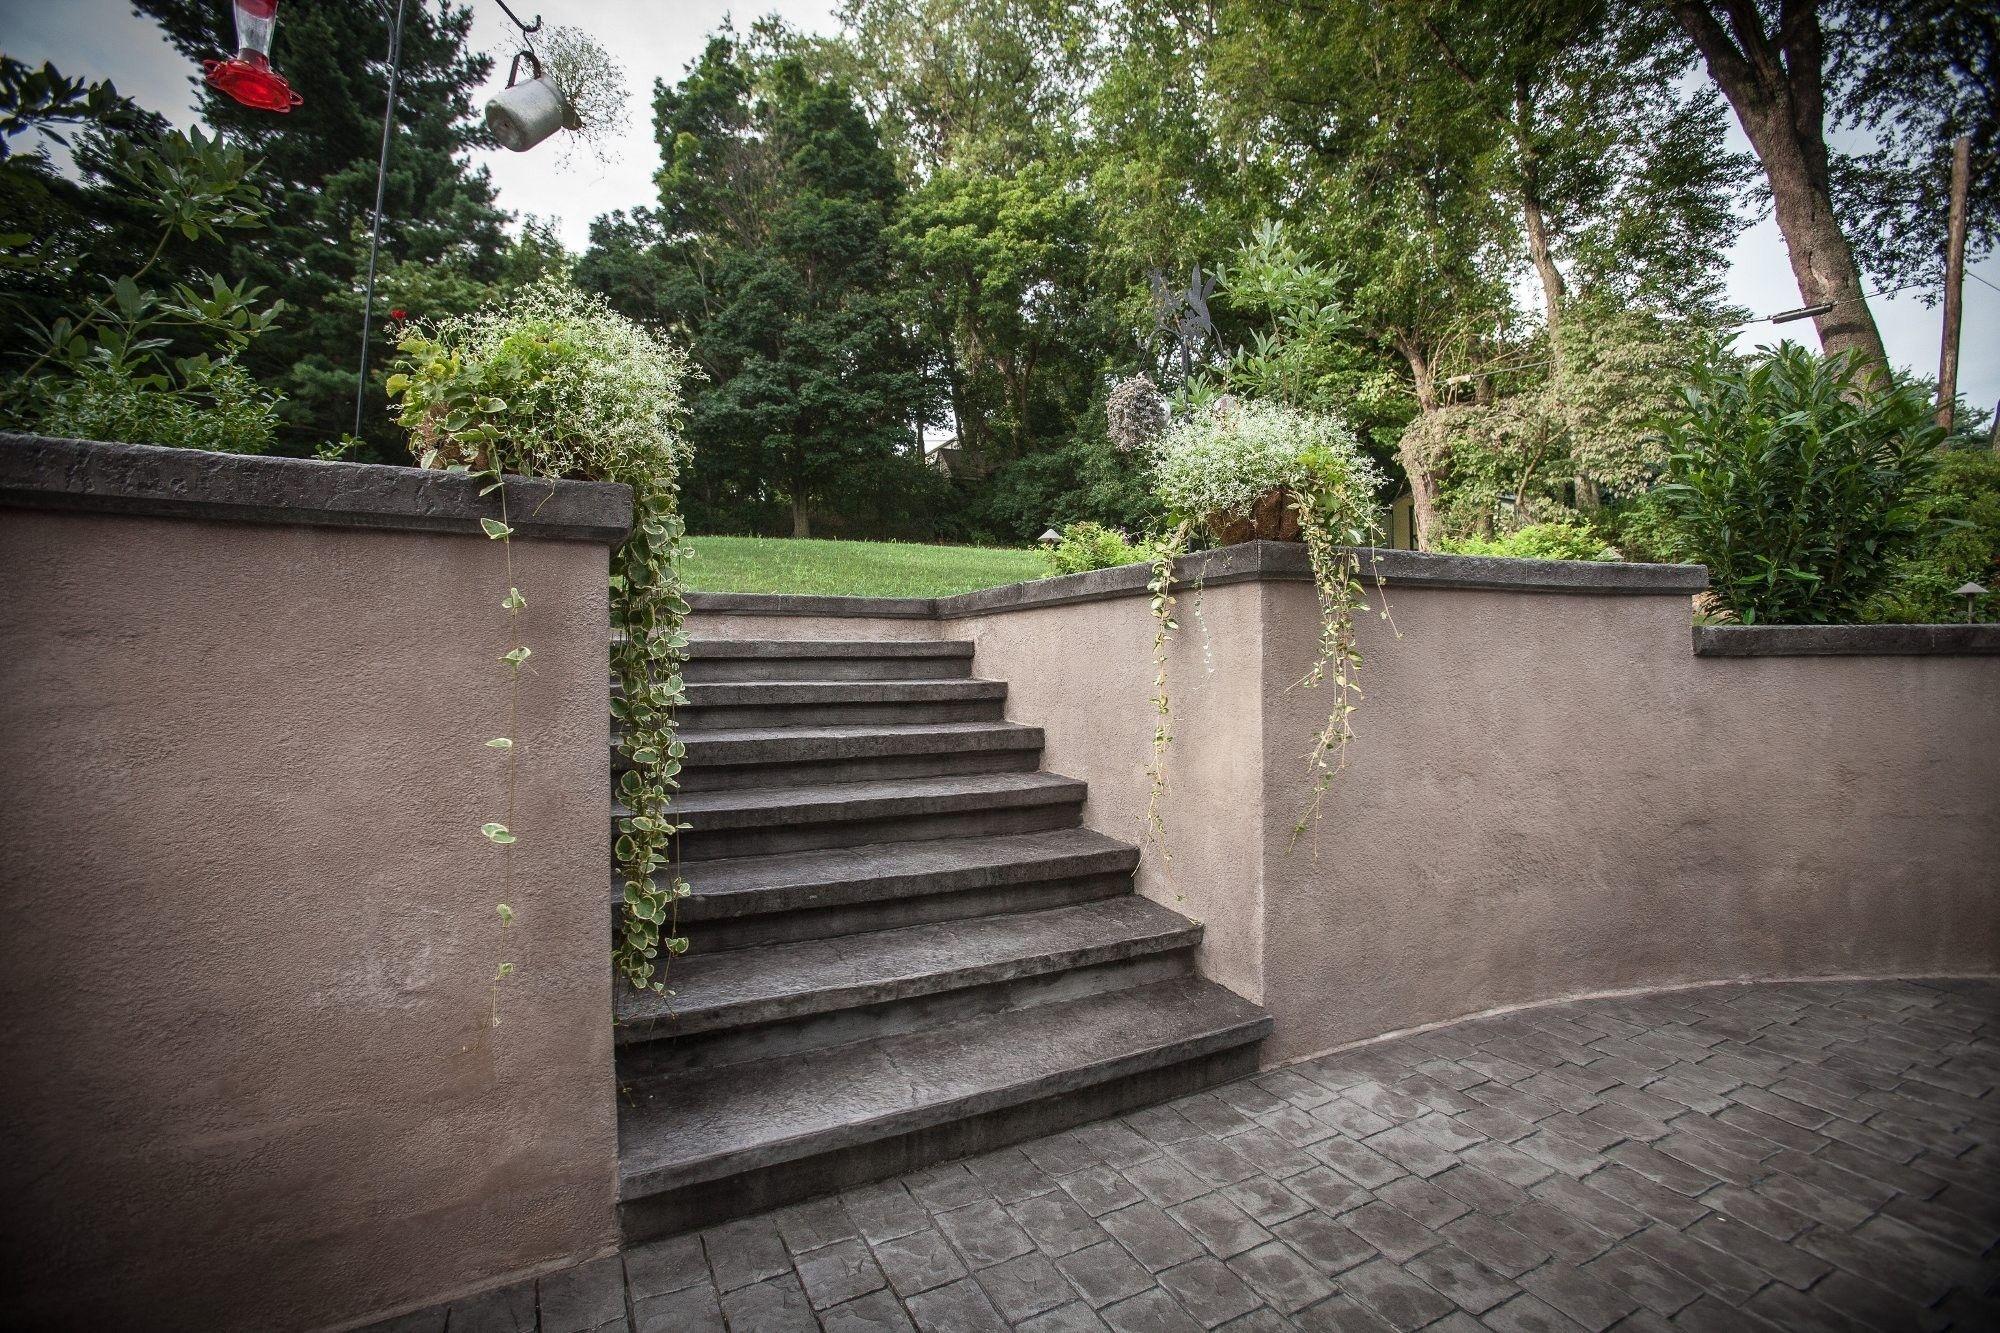 Concrete Sleeper Retaining Wall Garden Renovators Www Gardenrenovators Com Au Concrete Retaining Walls Concrete Sleeper Retaining Walls Sleeper Retaining Wall